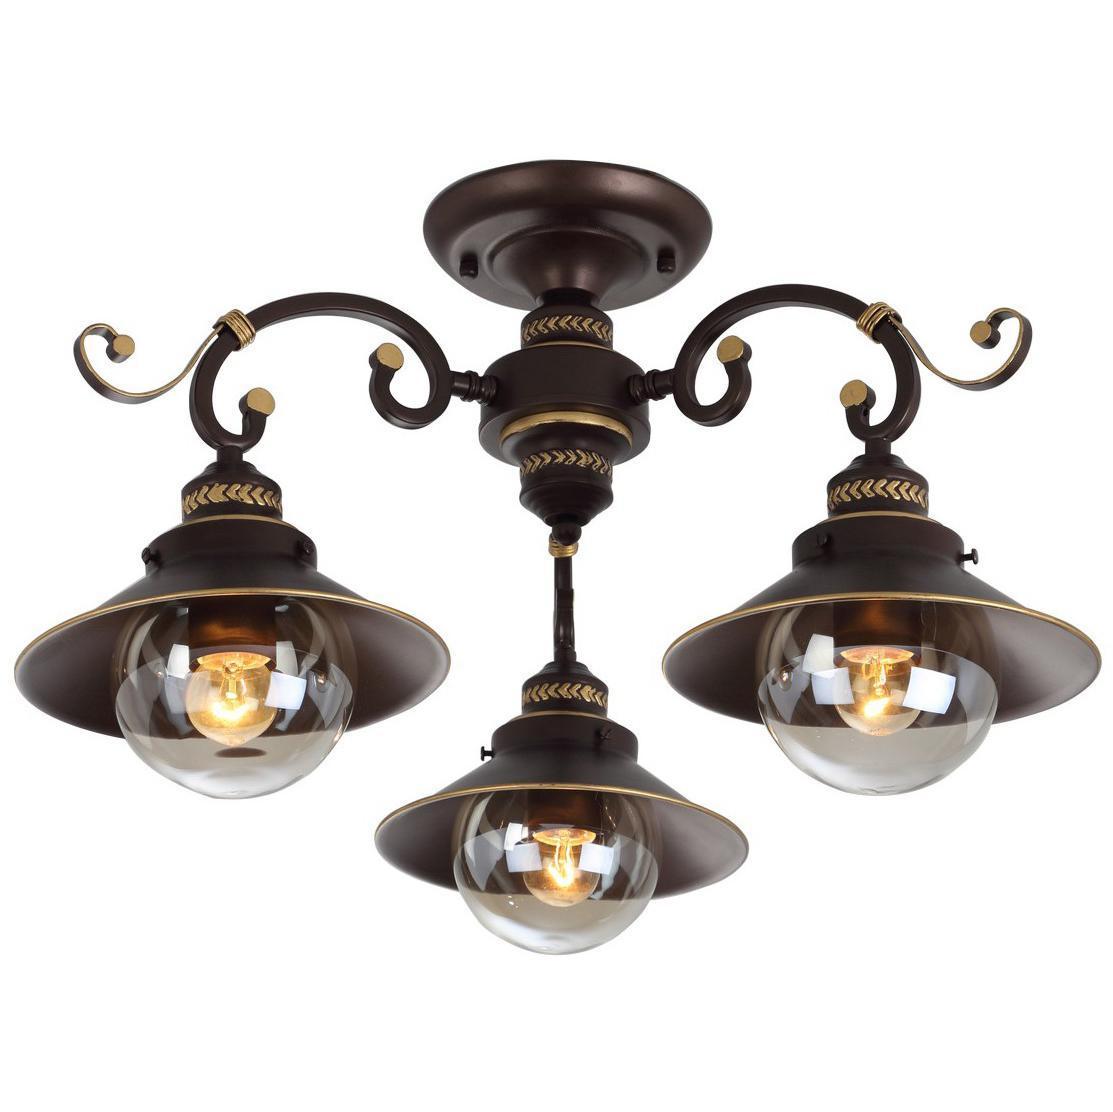 Люстра Arte Lamp 7 A4577PL-3CK потолочная потолочная люстра arte lamp 7 a4577pl 8wg